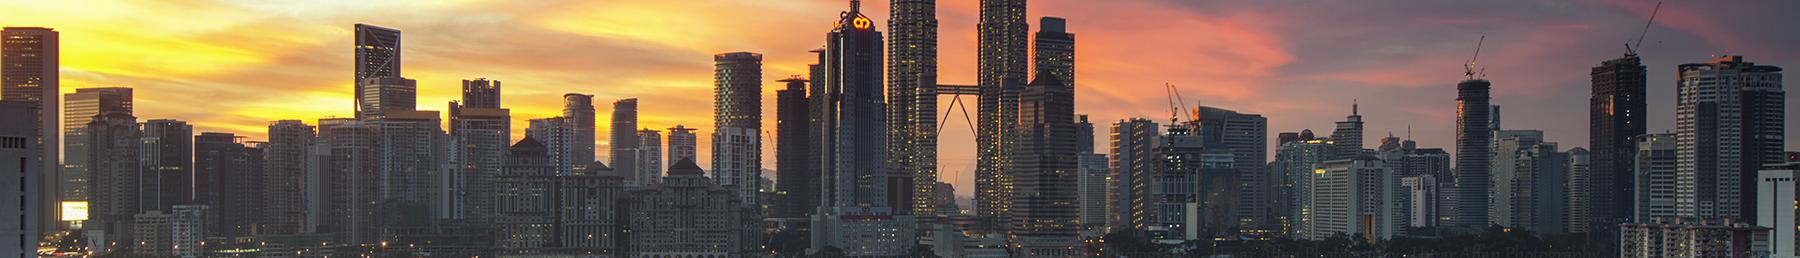 Kuala Lumpur/Golden Triangle – Travel guide at Wikivoyage